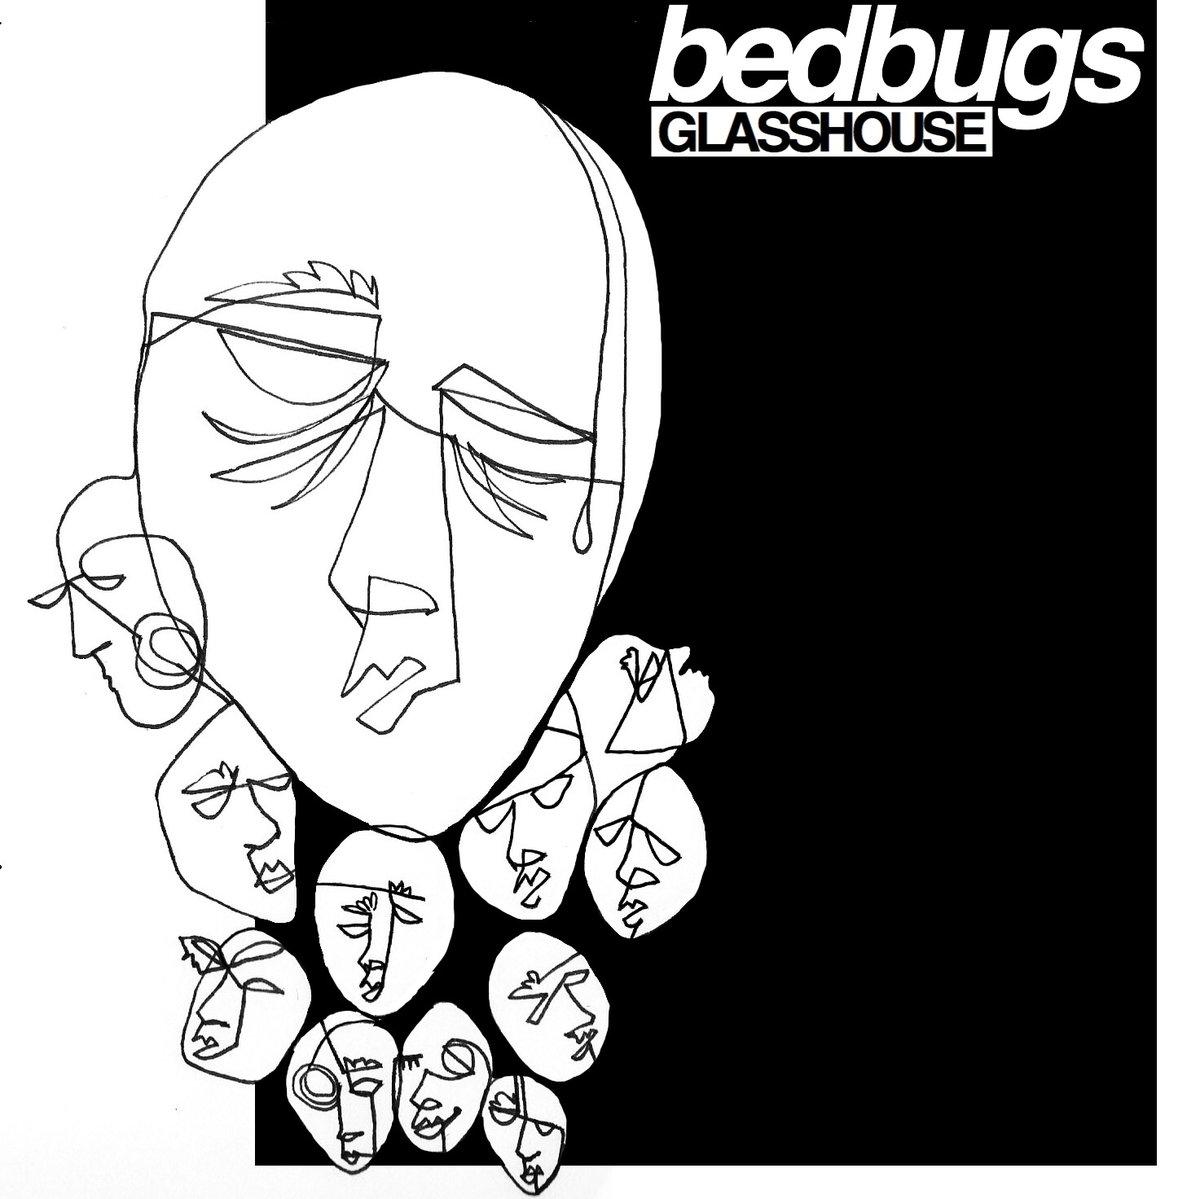 Glasshouse by bedbugs